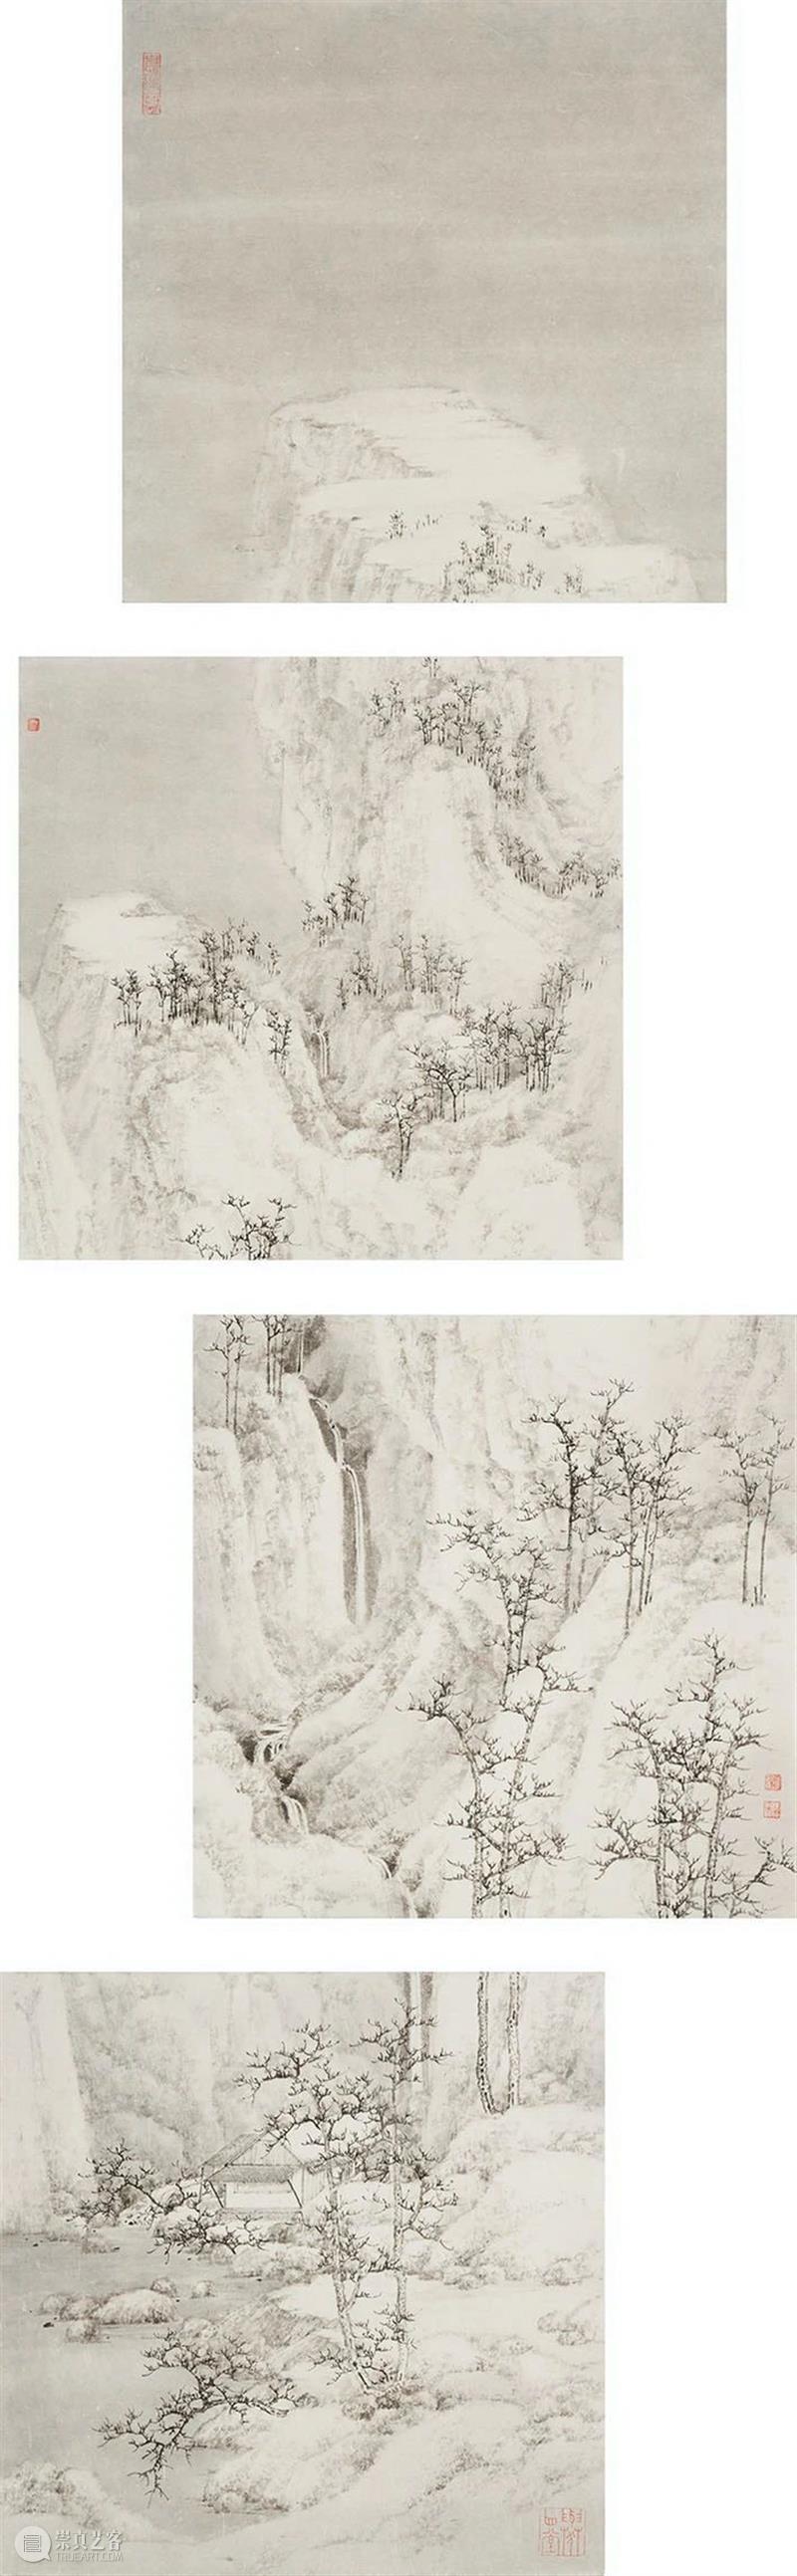 M50展览 |「坐看云起」管伟邦个展 | 亚洲艺术中心(上海)  亚洲艺术中心 崇真艺客